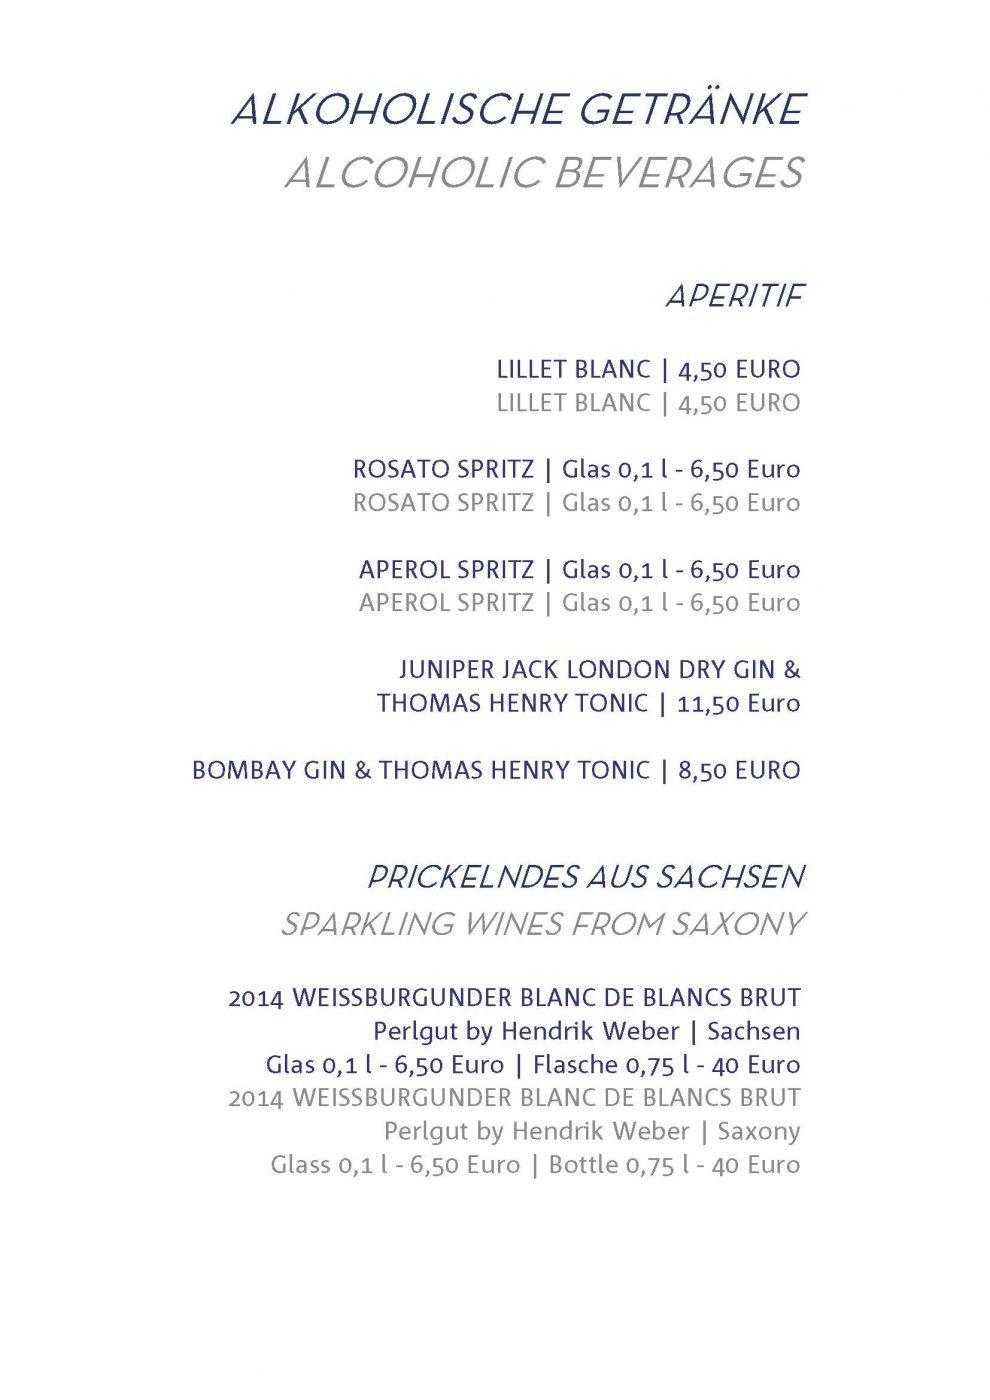 https://www.vitrum-dresden.de/wp-content/uploads/2018/08/3_AlkoholischeGetraenke_final_web_Seite_1-990x1400.jpg